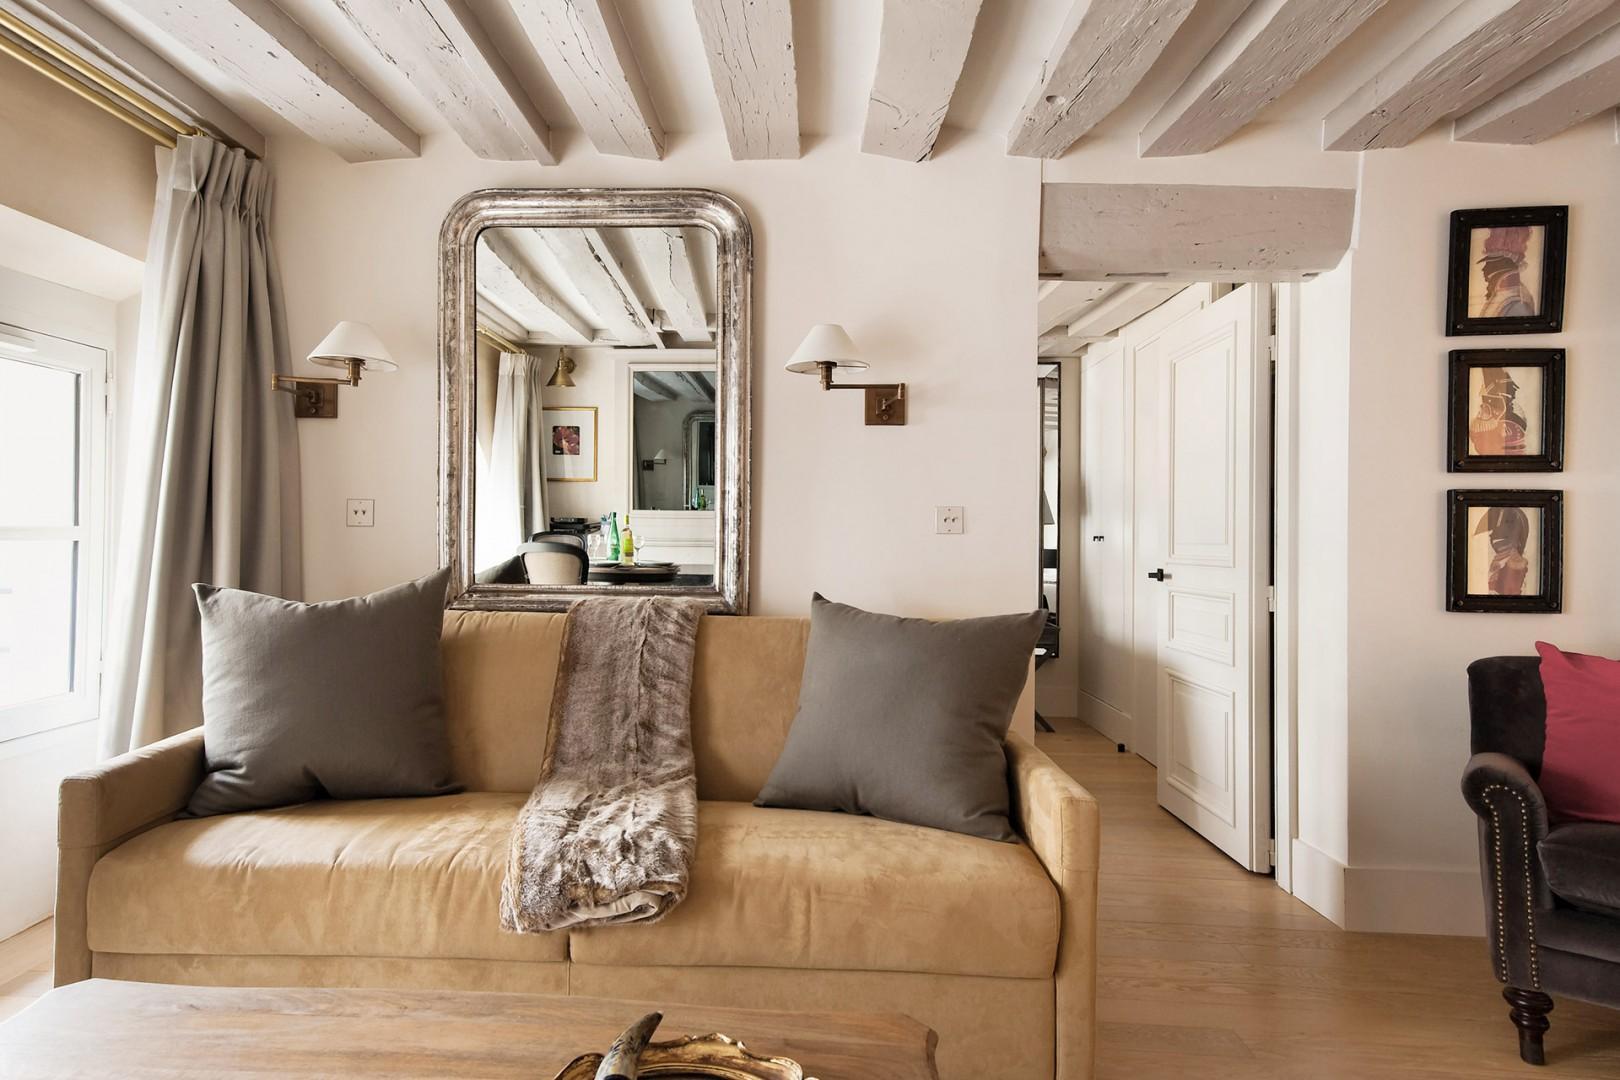 Simple, yet glamorous interiors